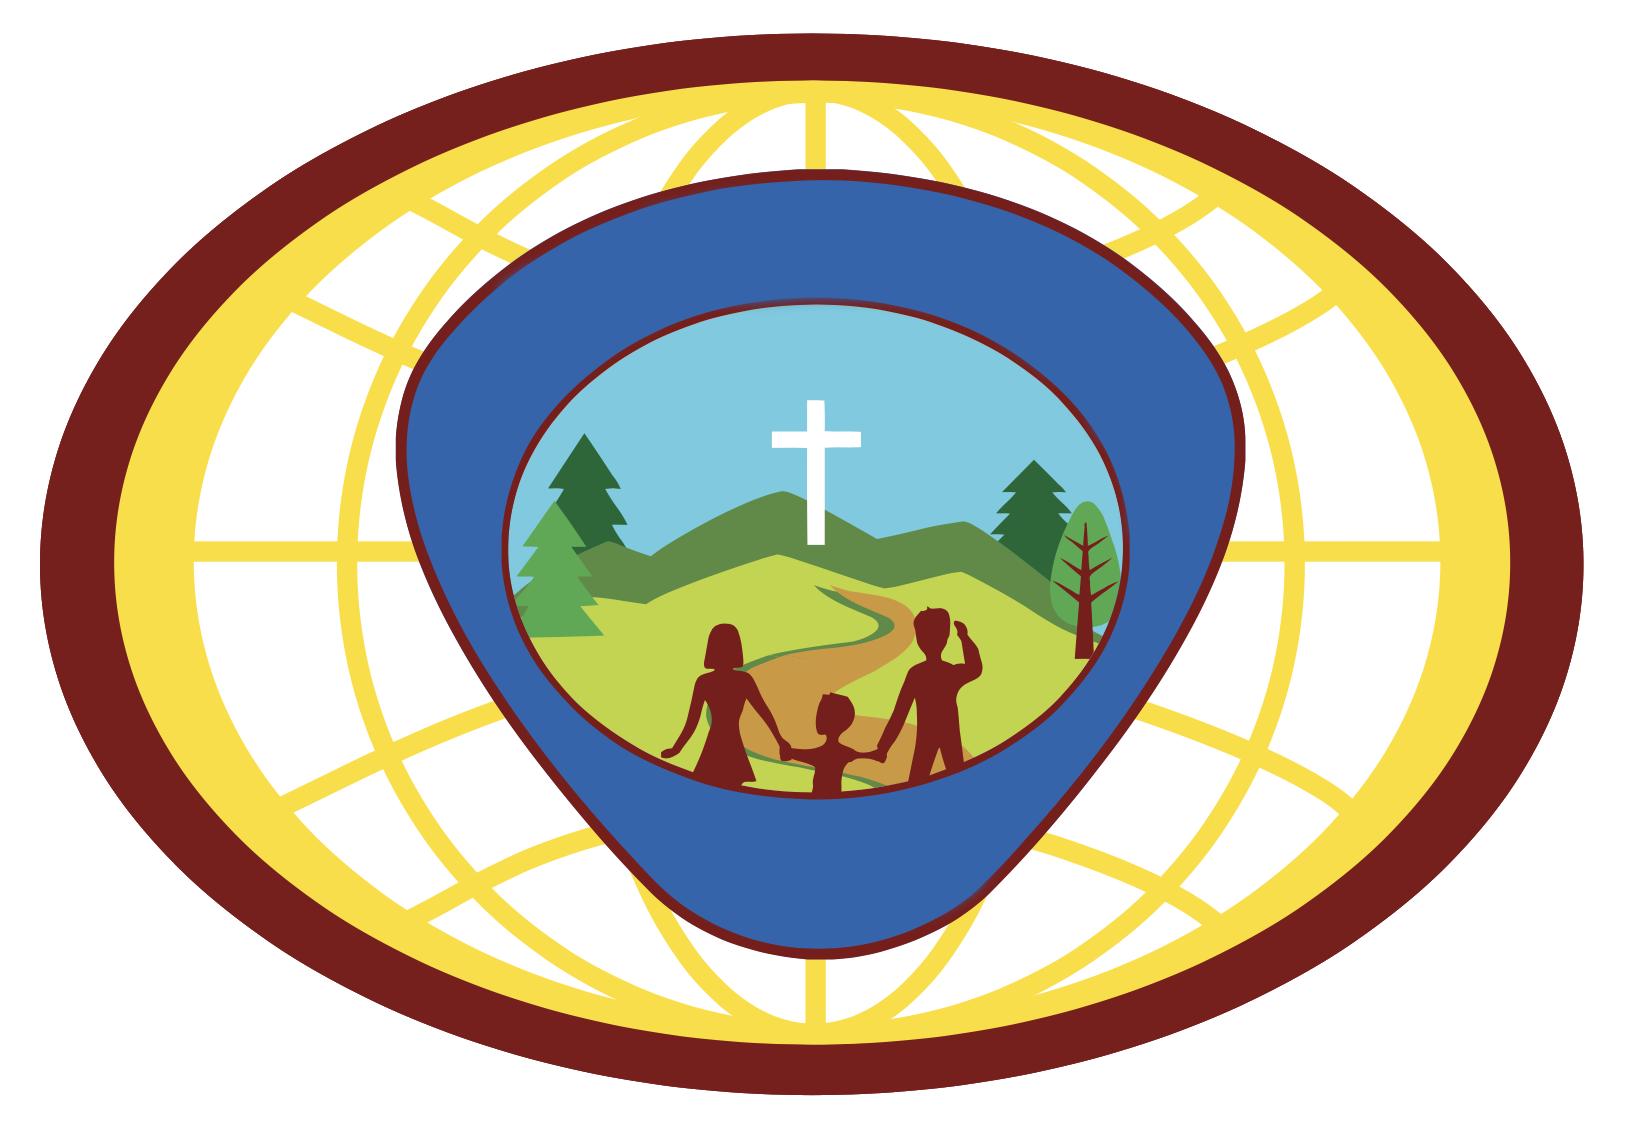 Adventurer World Logo Png 1625 1122 Adventure Badge Pathfinder